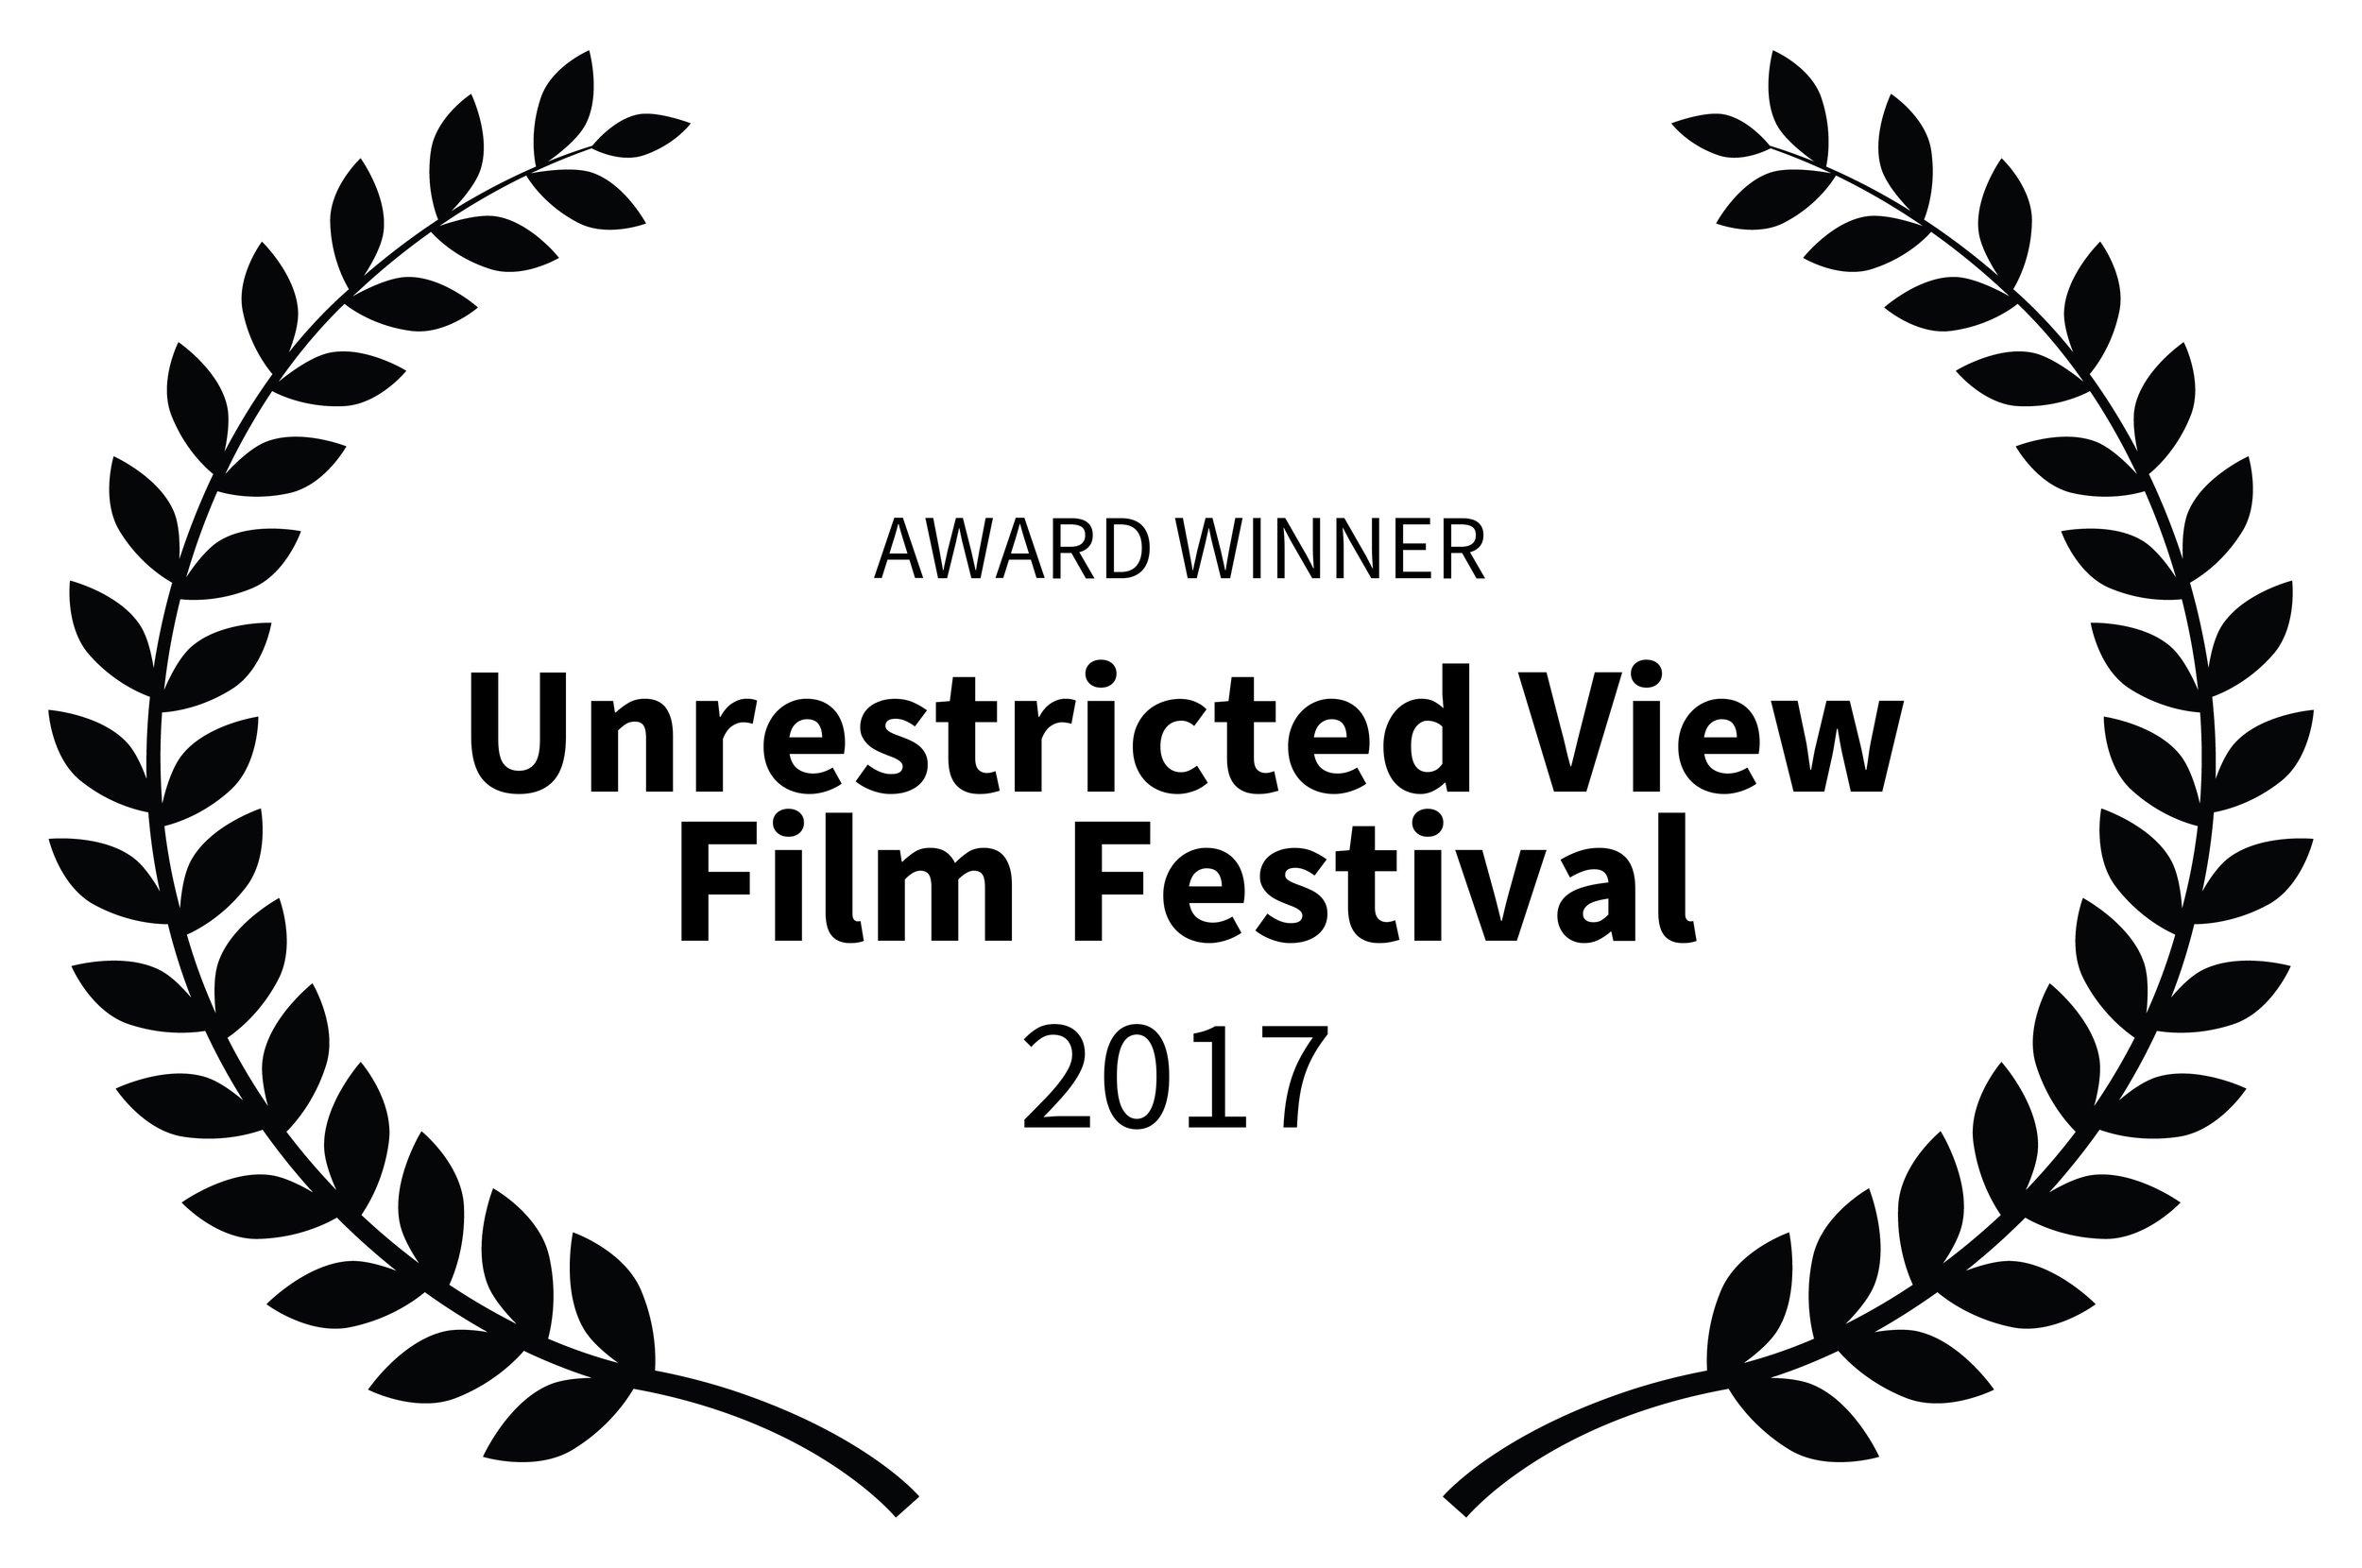 X_AWARDWINNER-UnrestrictedViewFilmFestival-2017.jpg